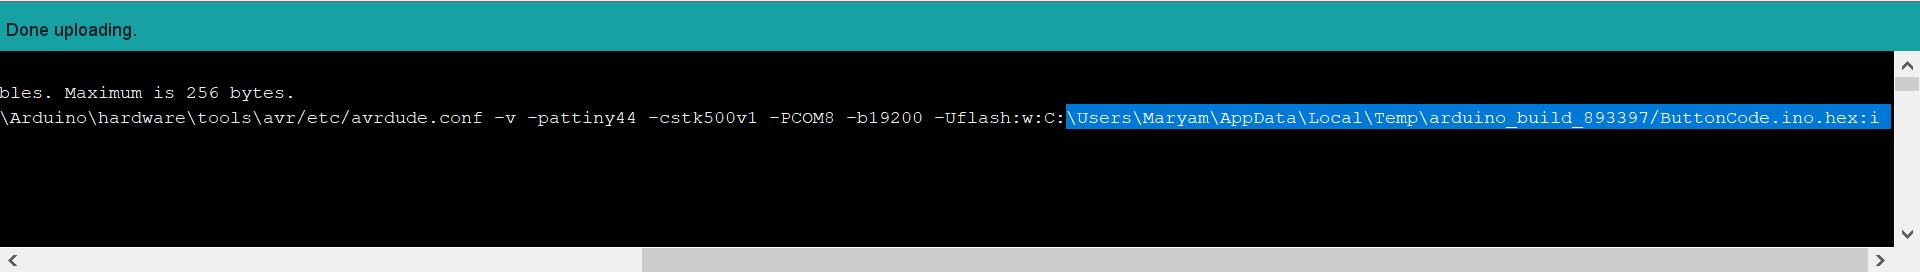 assets/images/week09/code.png